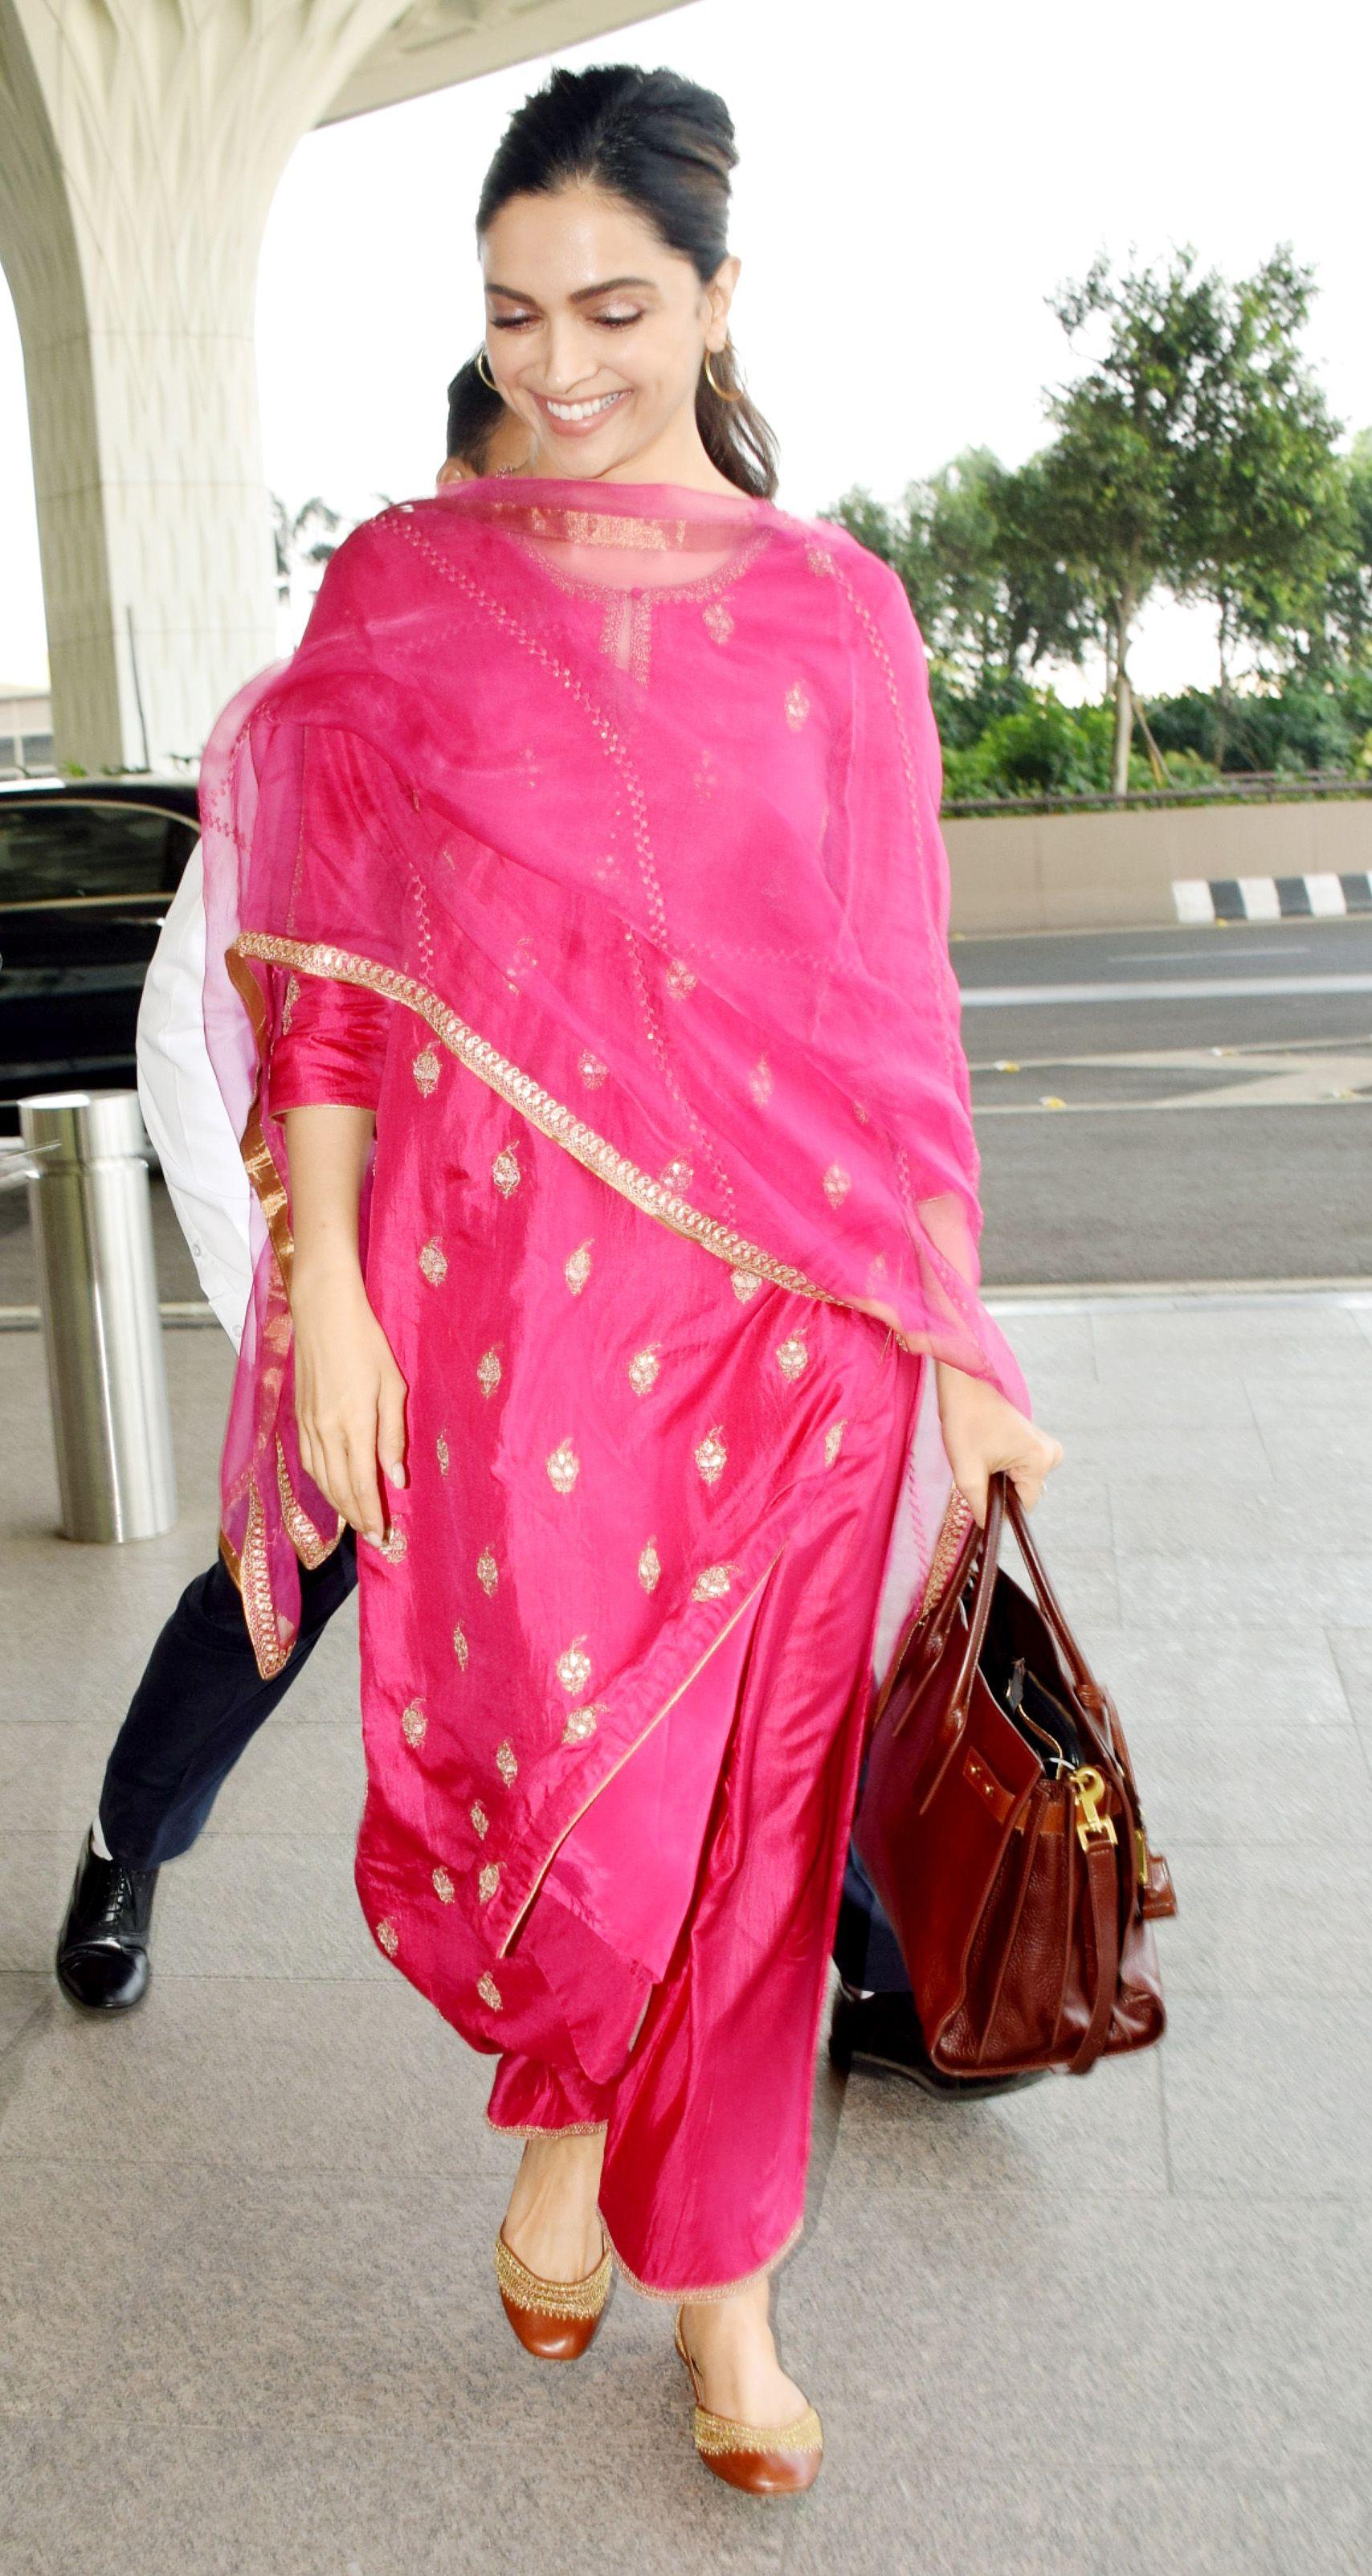 Deepika Padukone, Airport pictures, Harper's Bazaar, Chhapaak